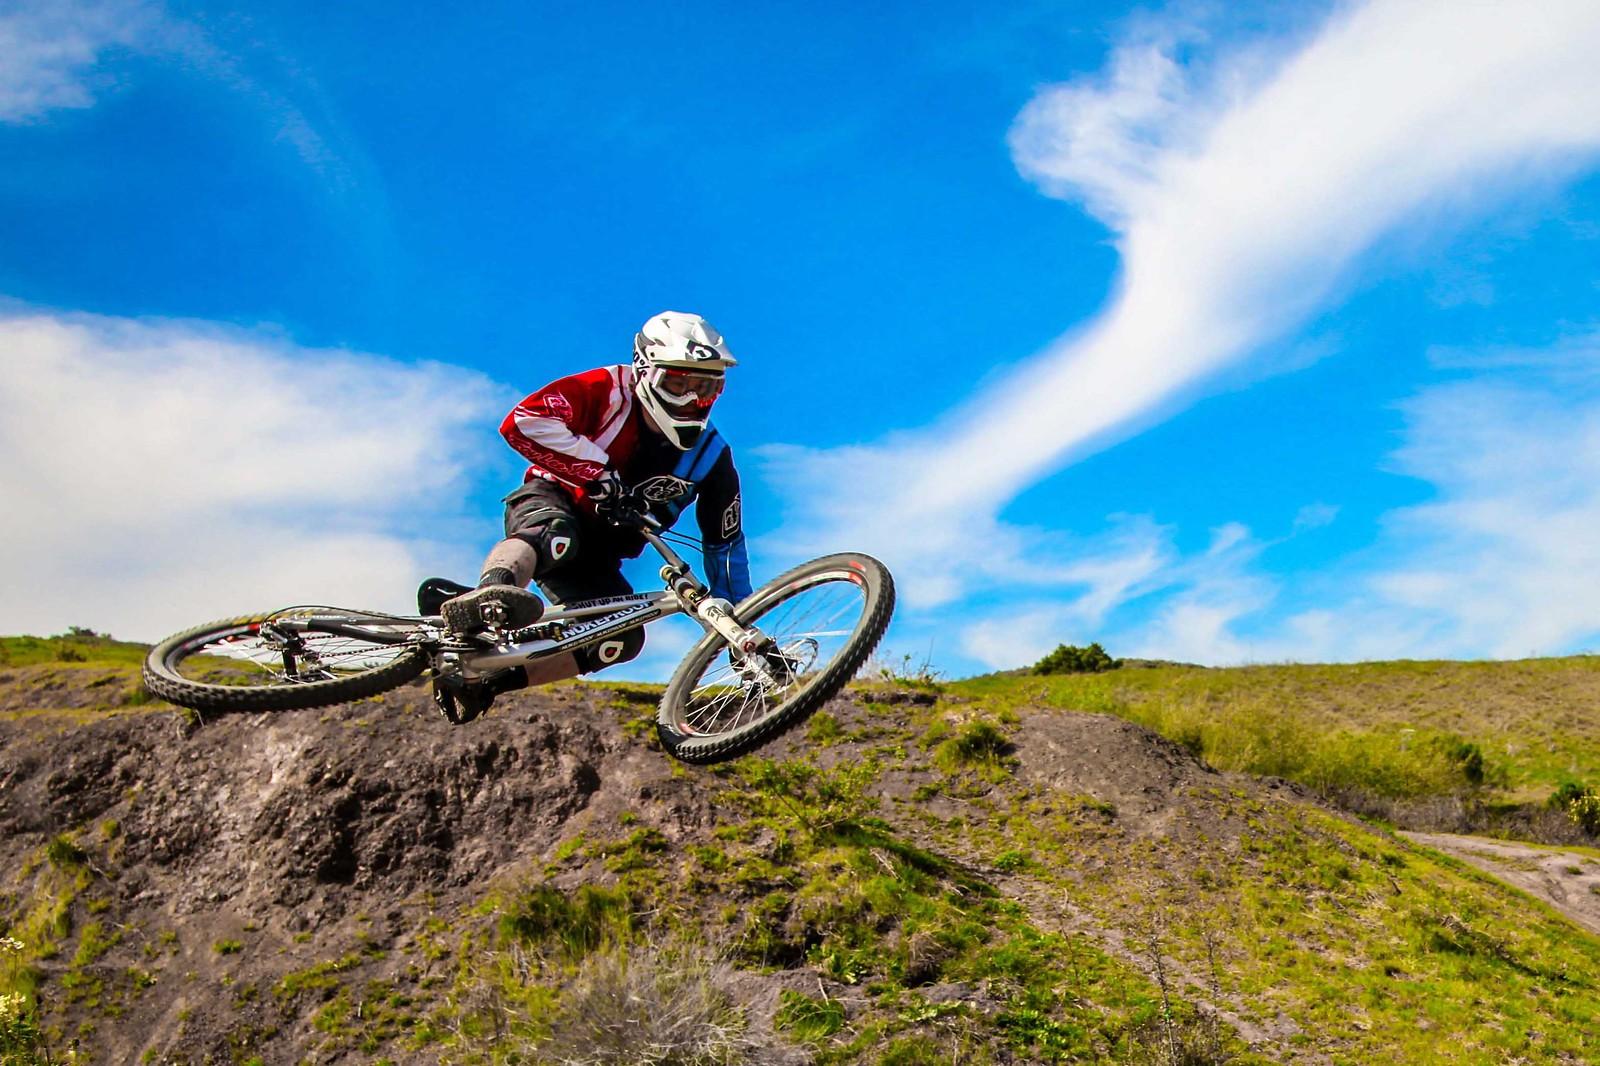 Kory Foley gets it sideways - GnarHuck - Mountain Biking Pictures - Vital MTB